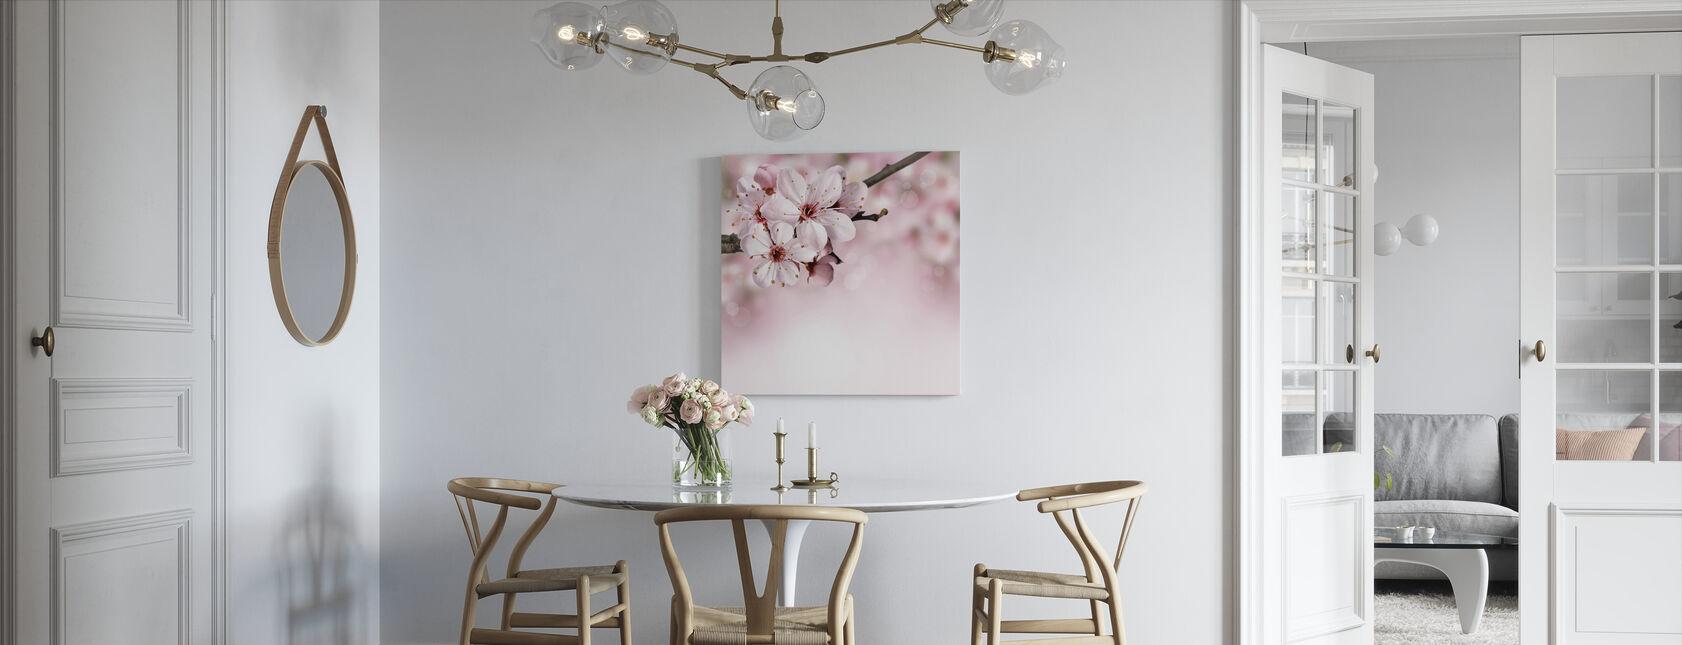 Lente grens kersenbloesem - Canvas print - Keuken